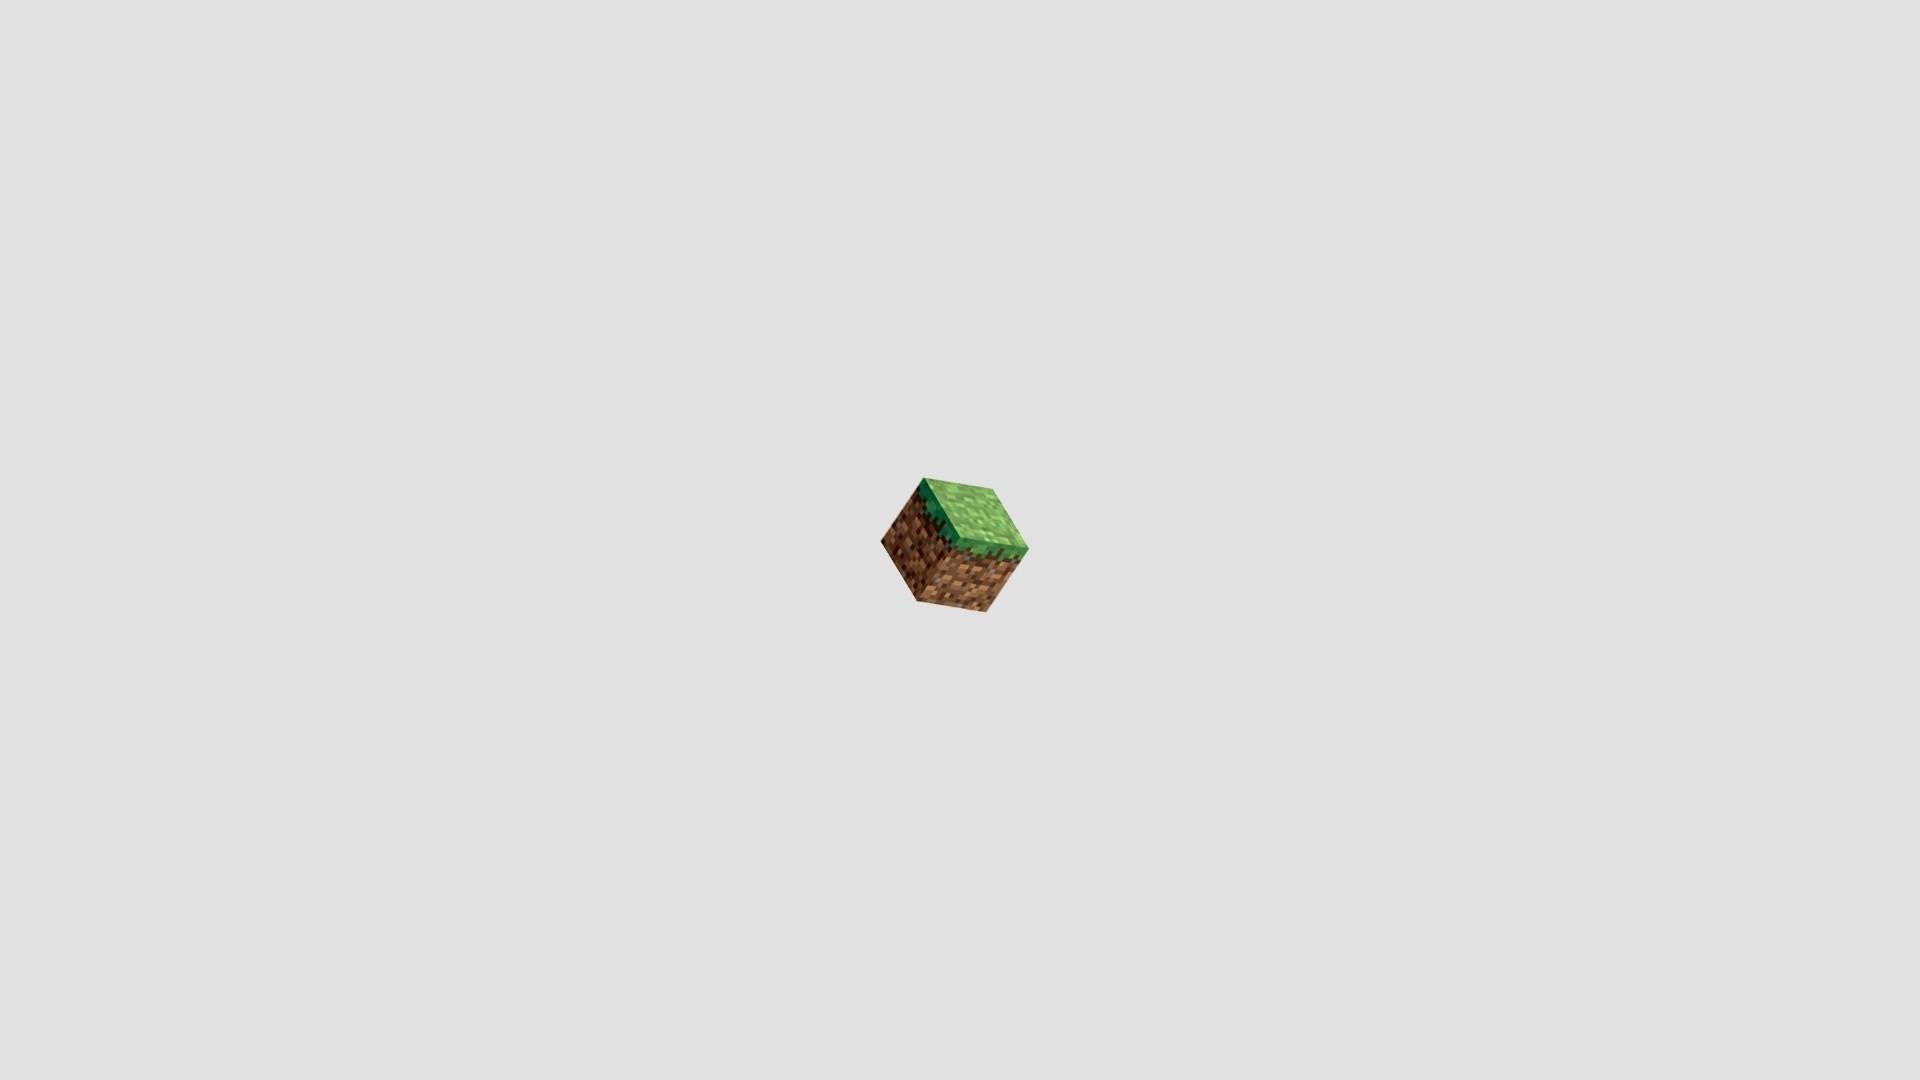 Minecraft Minimalist wallpaper for desktop